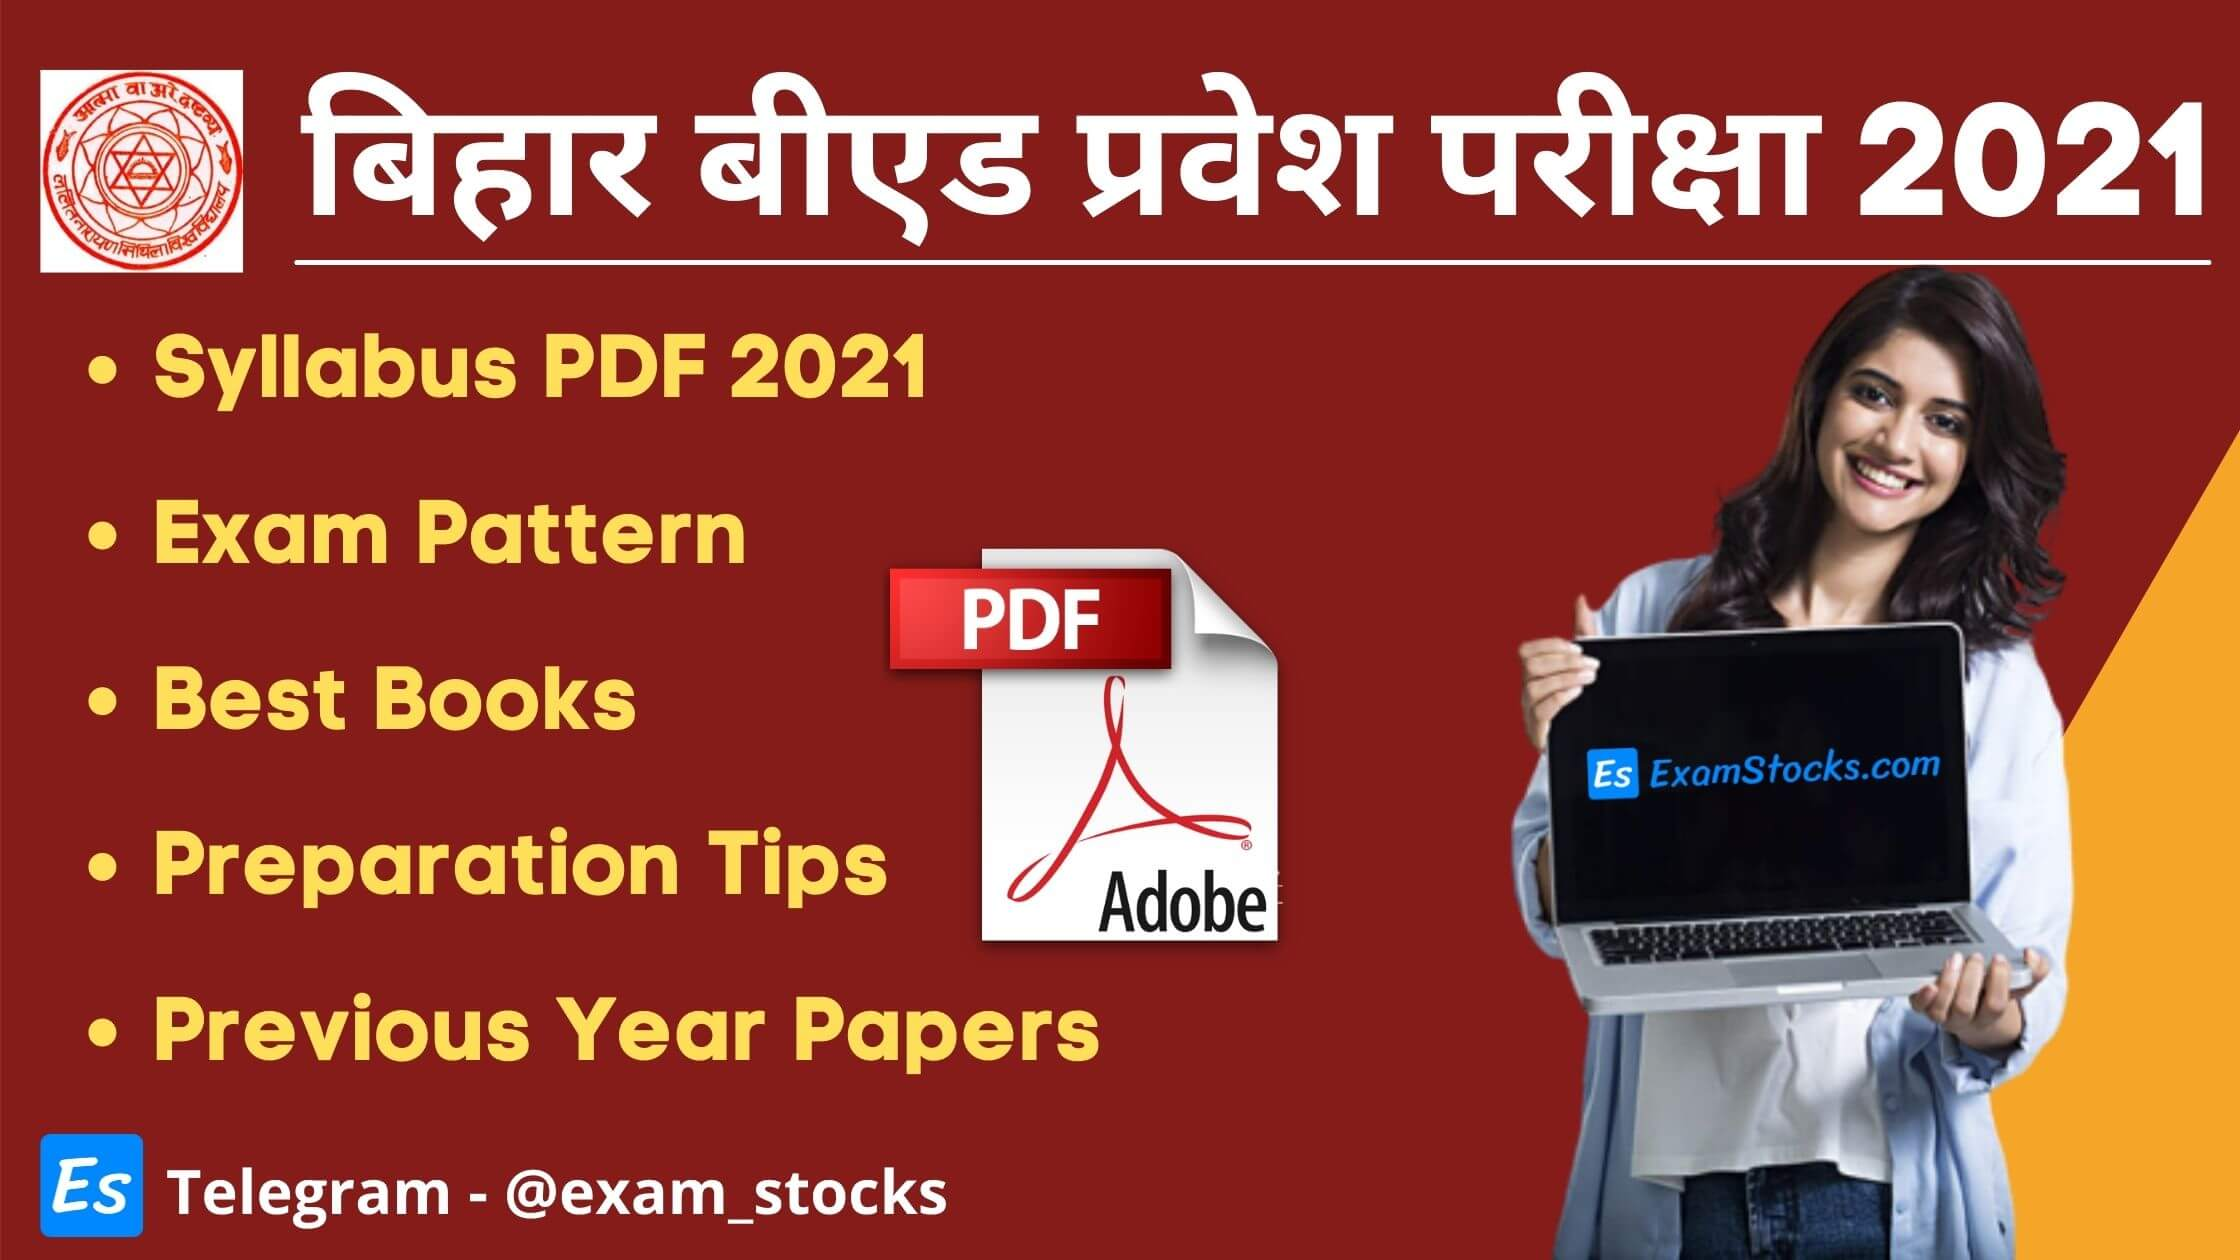 Bihar B.Ed CET Syllabus PDF 2021, Exam Pattern, Books & Preparation